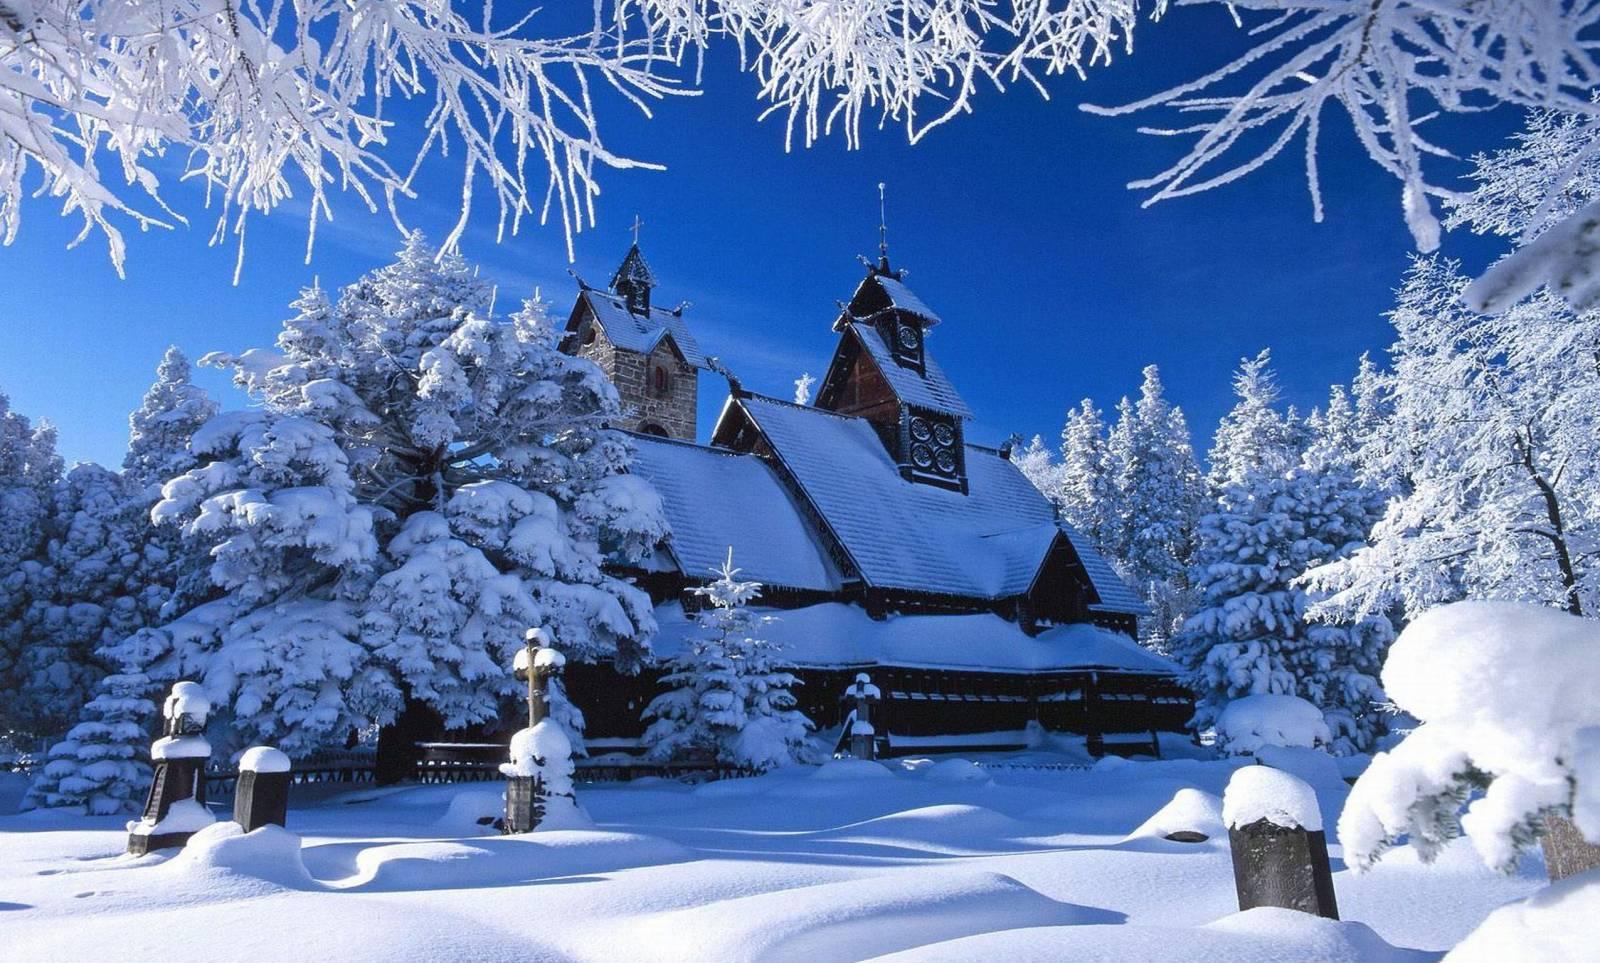 zasnezeny kostol, dreveny kostol, zasnezene stromy, cintorin, zima, sneh 149475